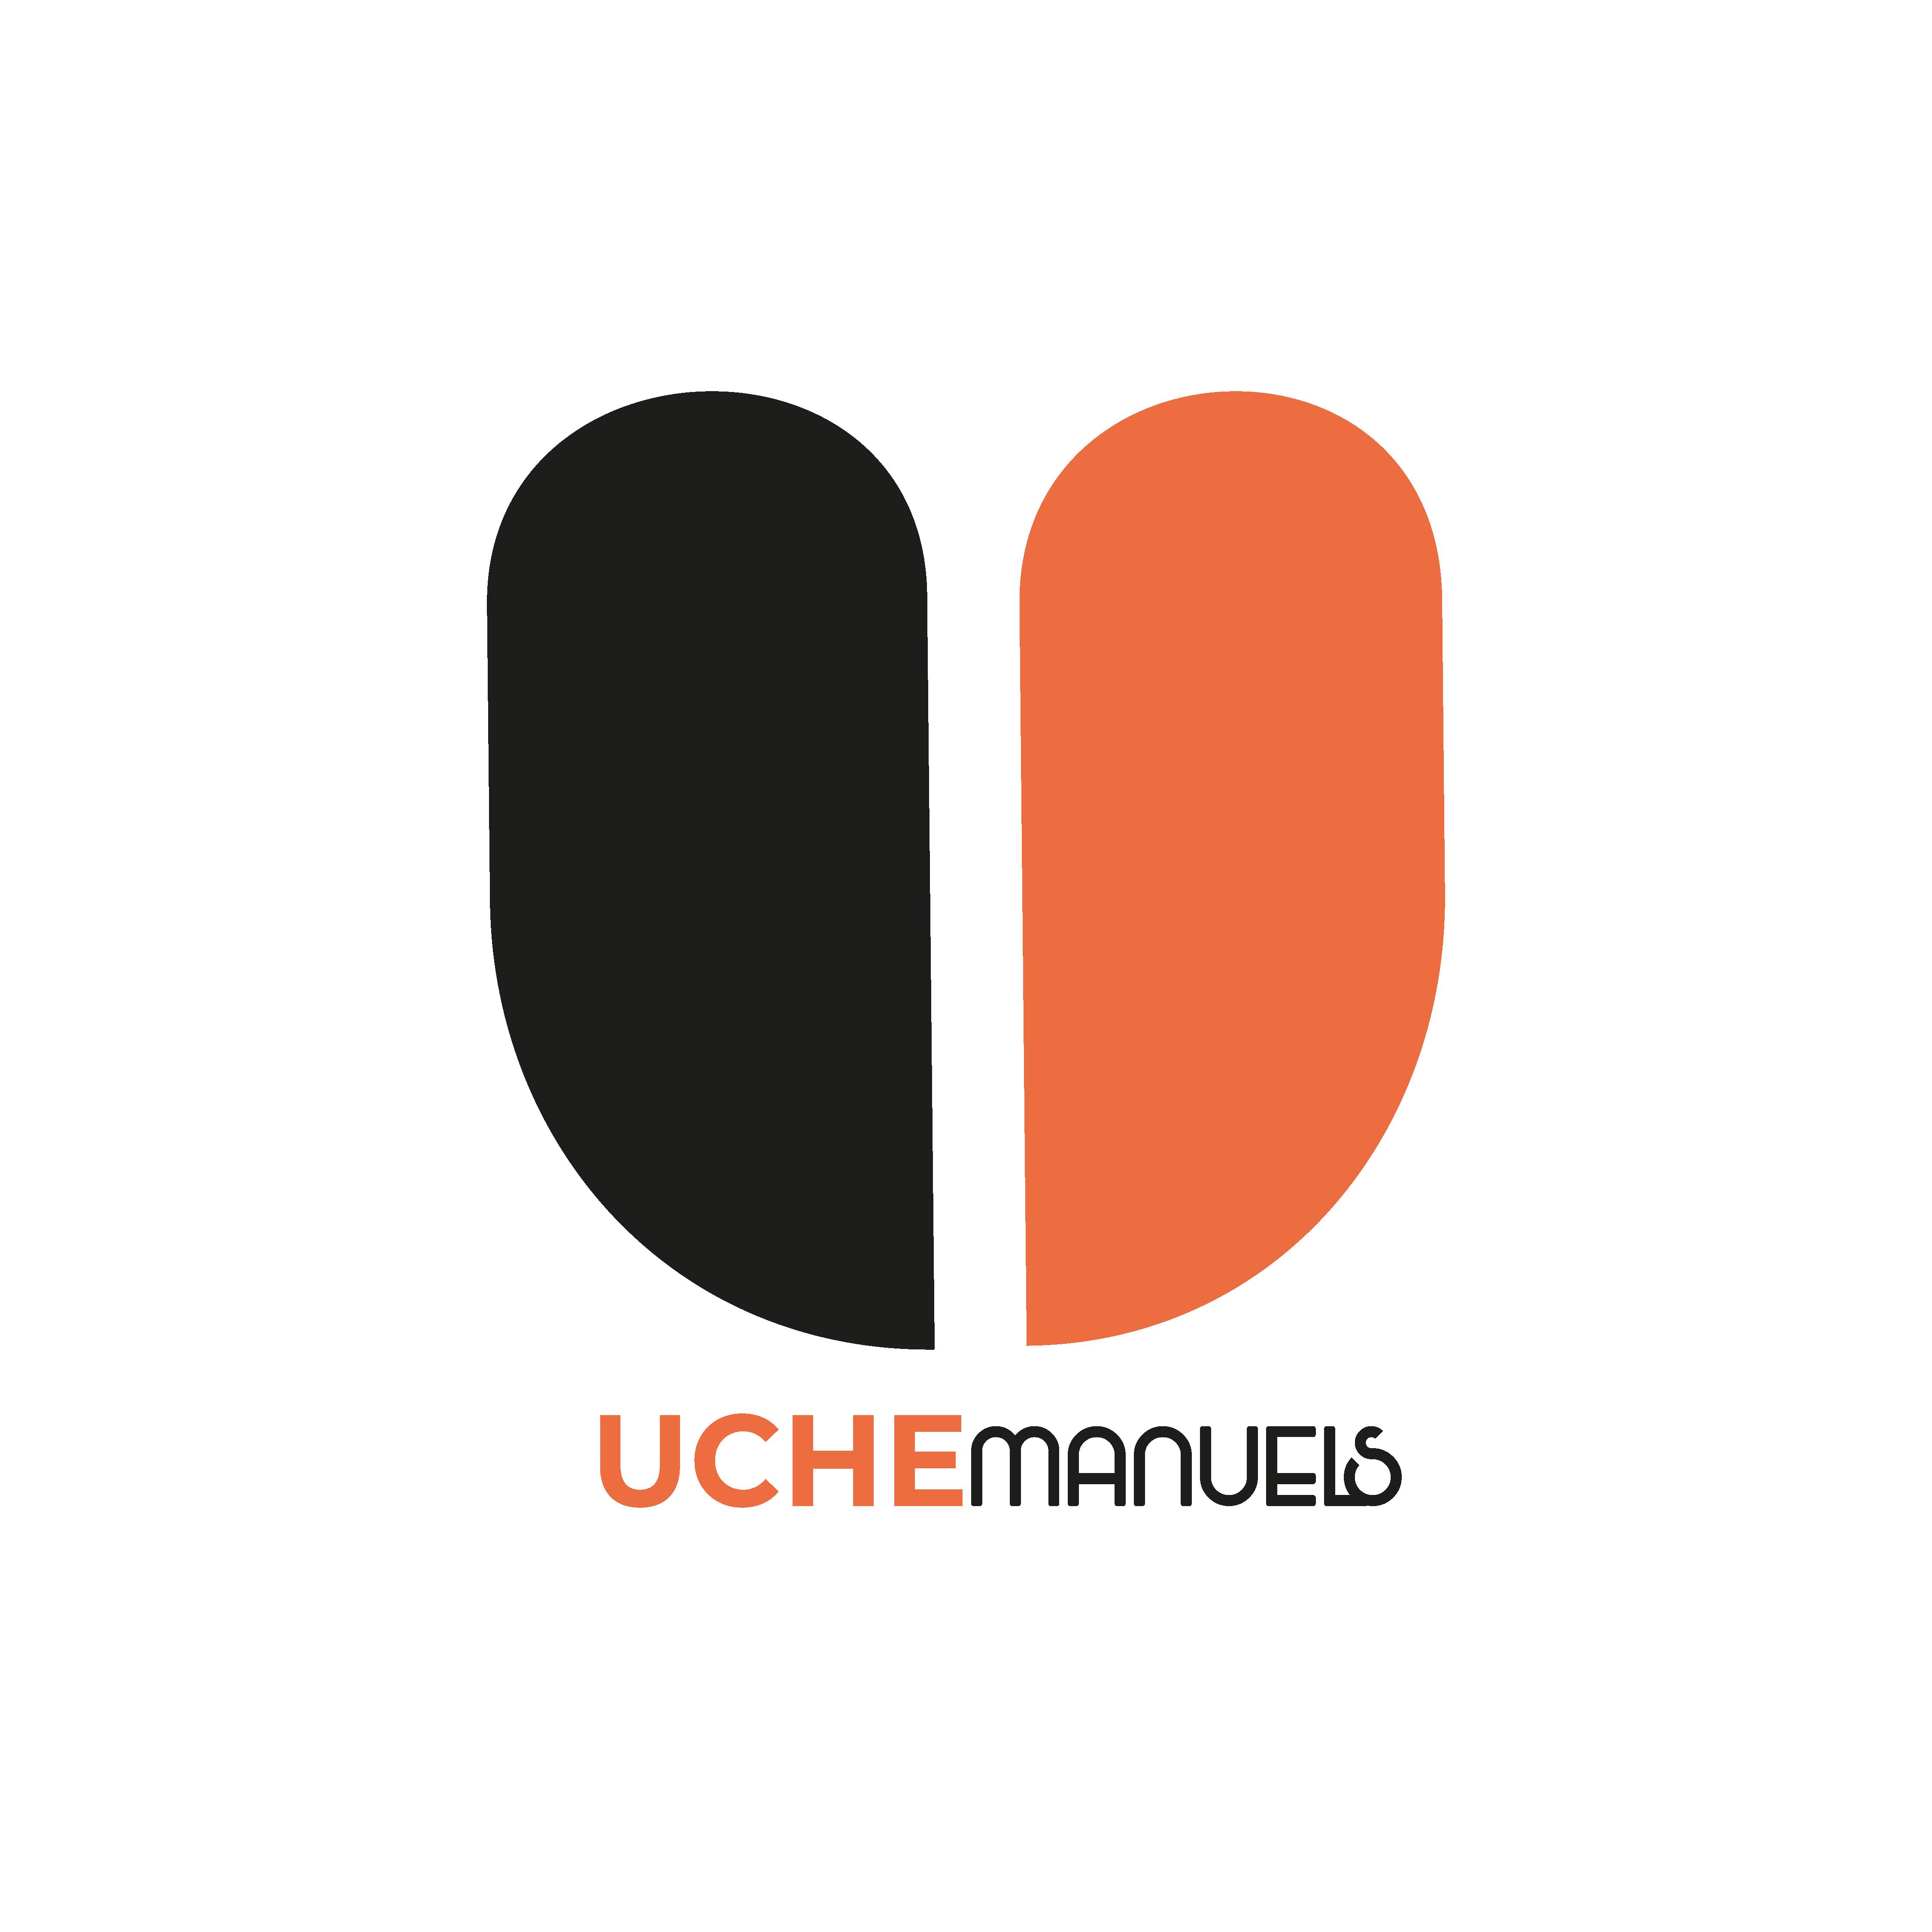 uchemanuels-01